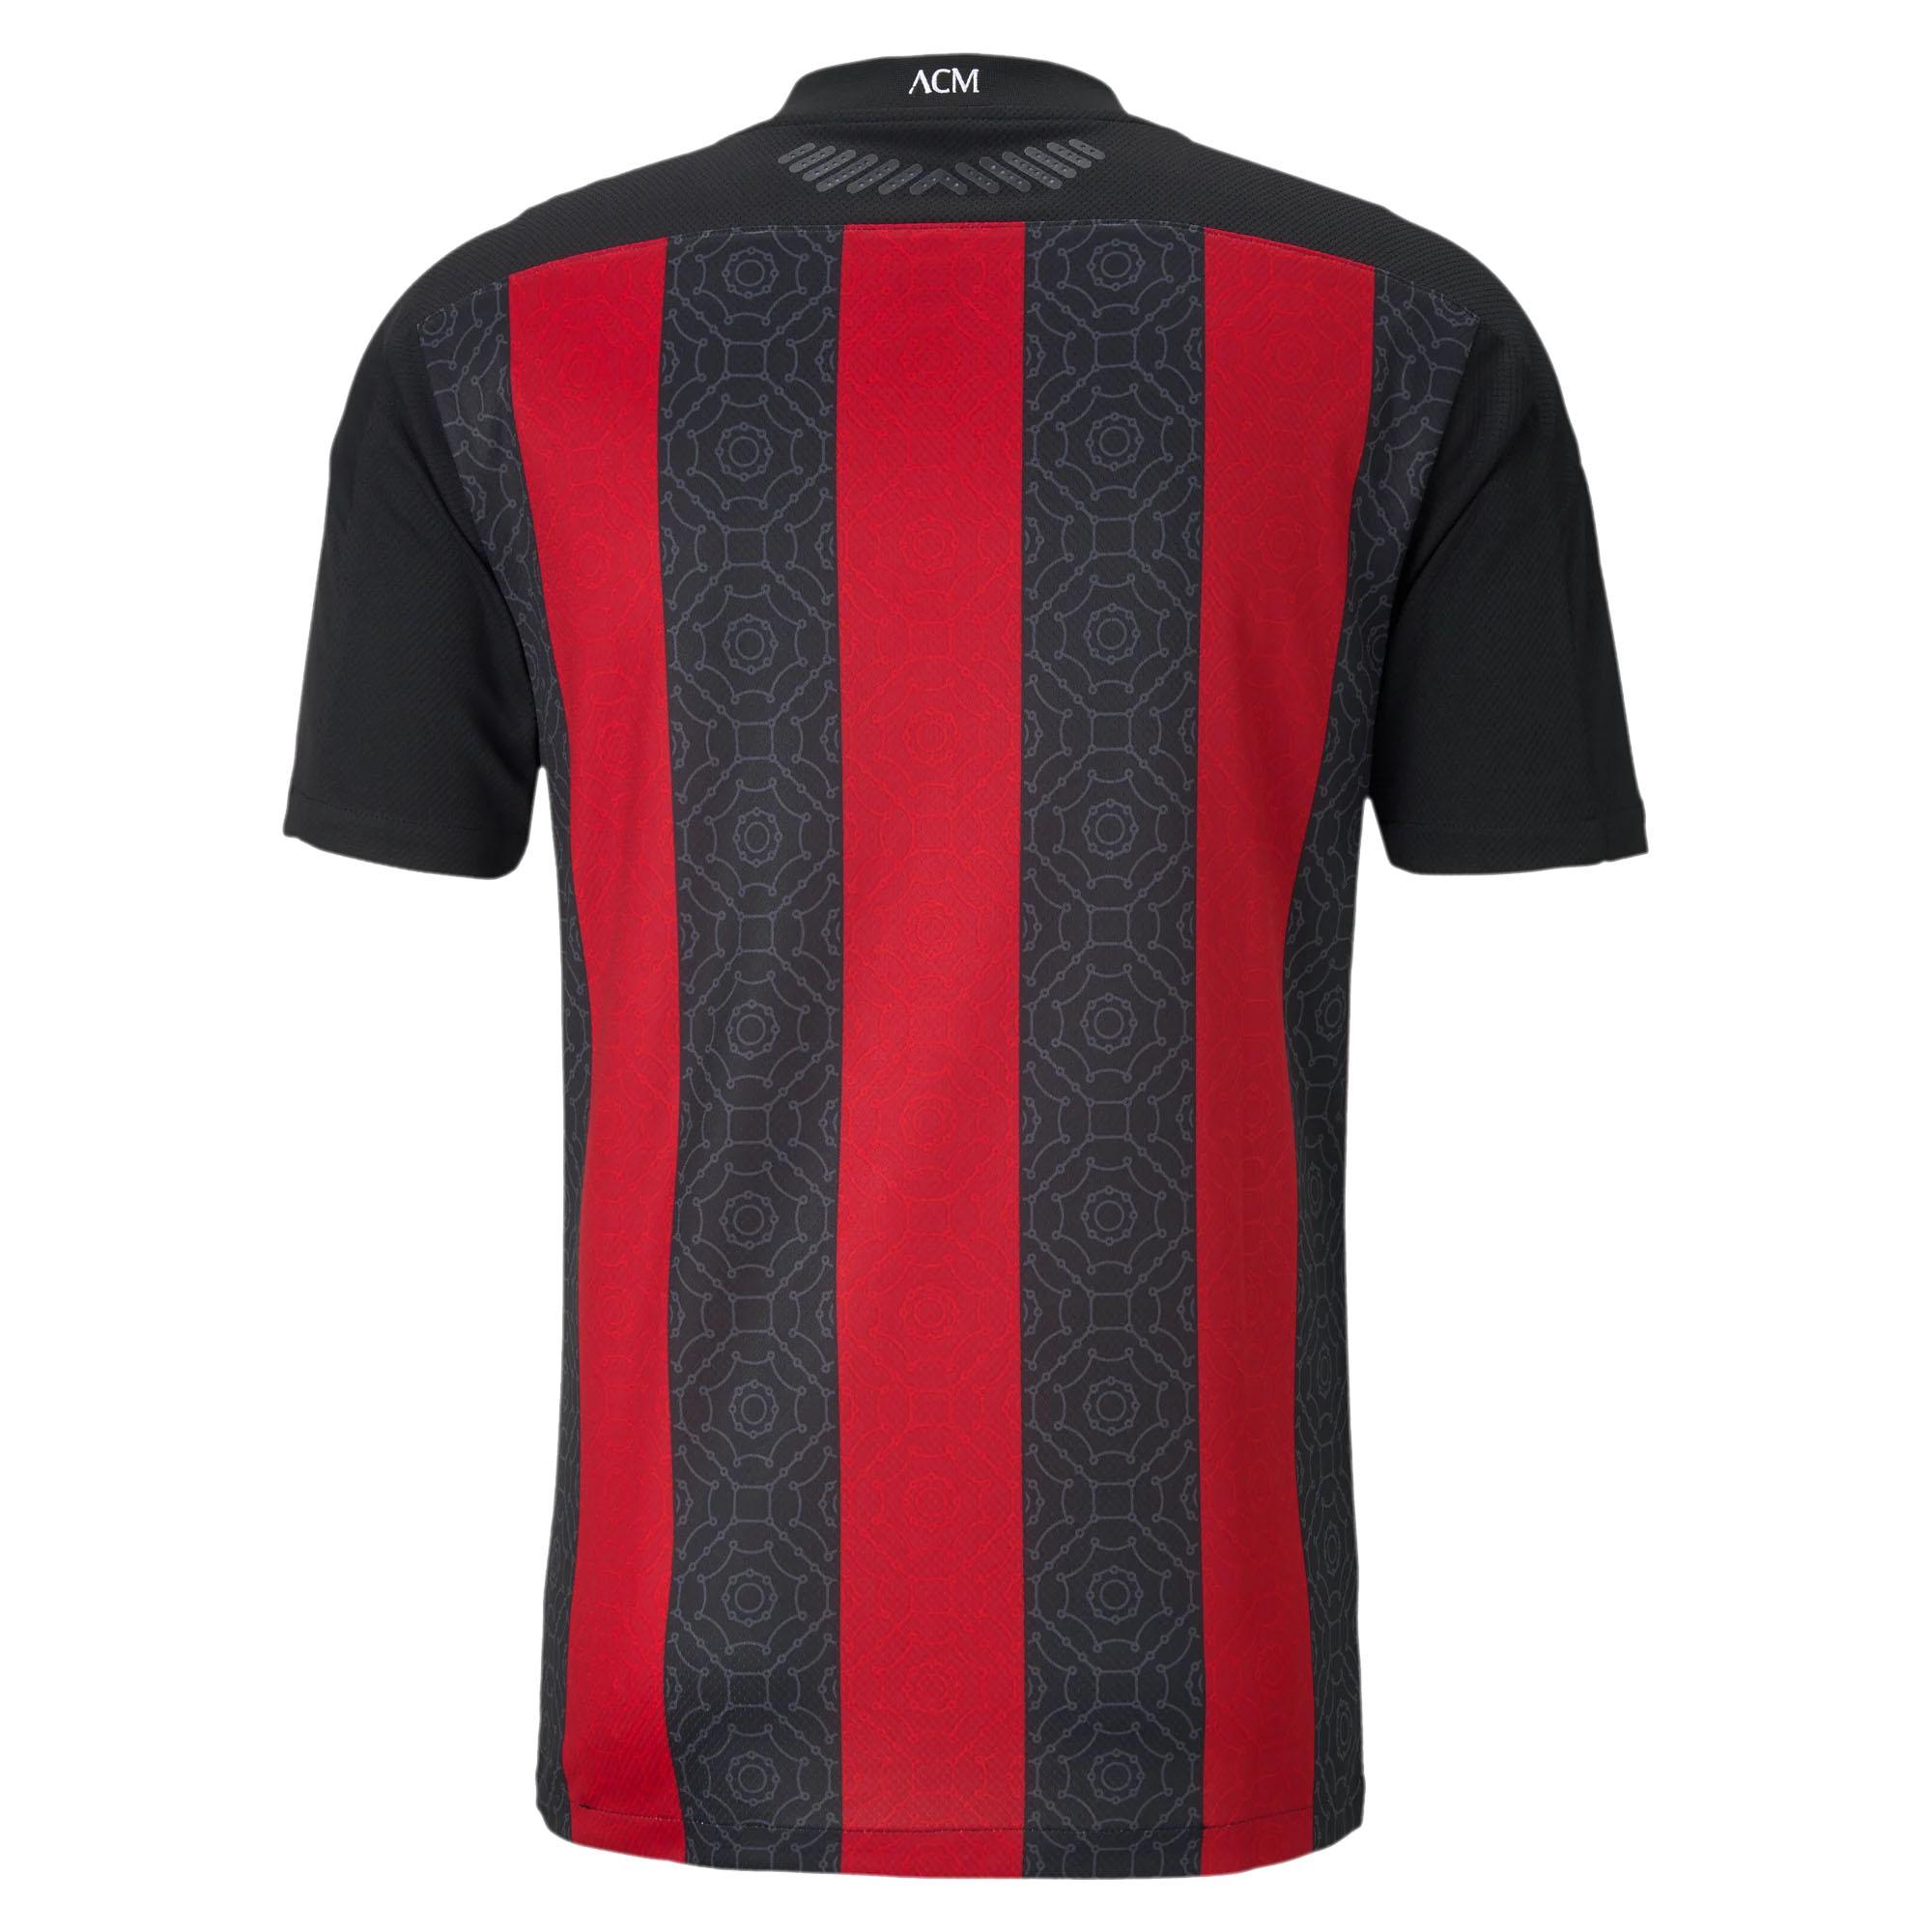 Maglia AC Milan 2020/21 Puma PUMA | 270000021 | 757277001